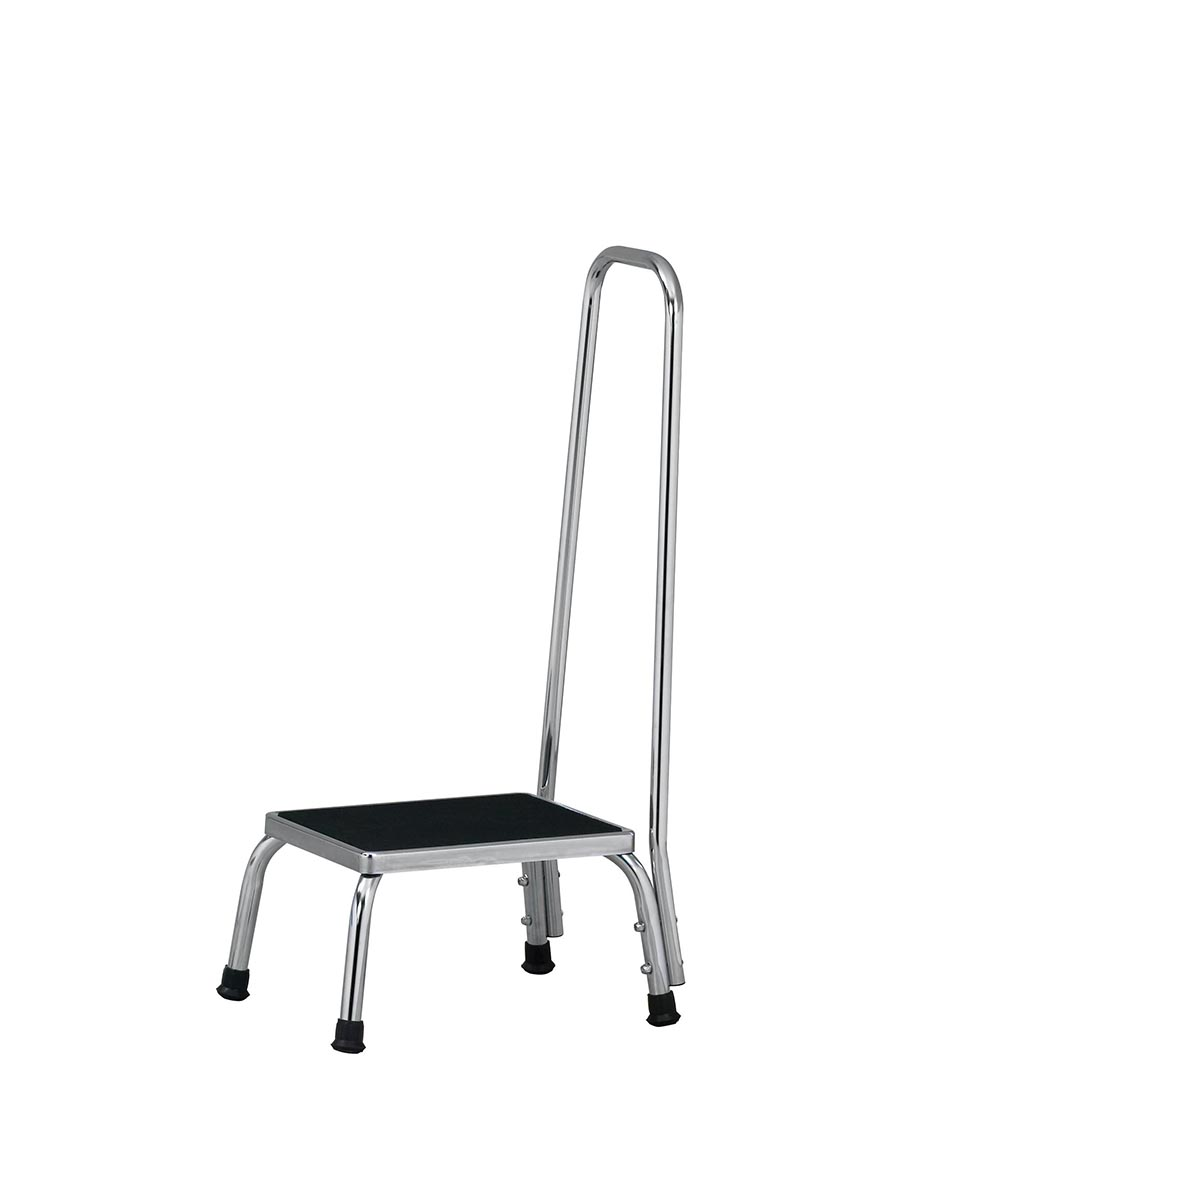 Chrome Step Stool W Handrail W65068 Clinton T 50